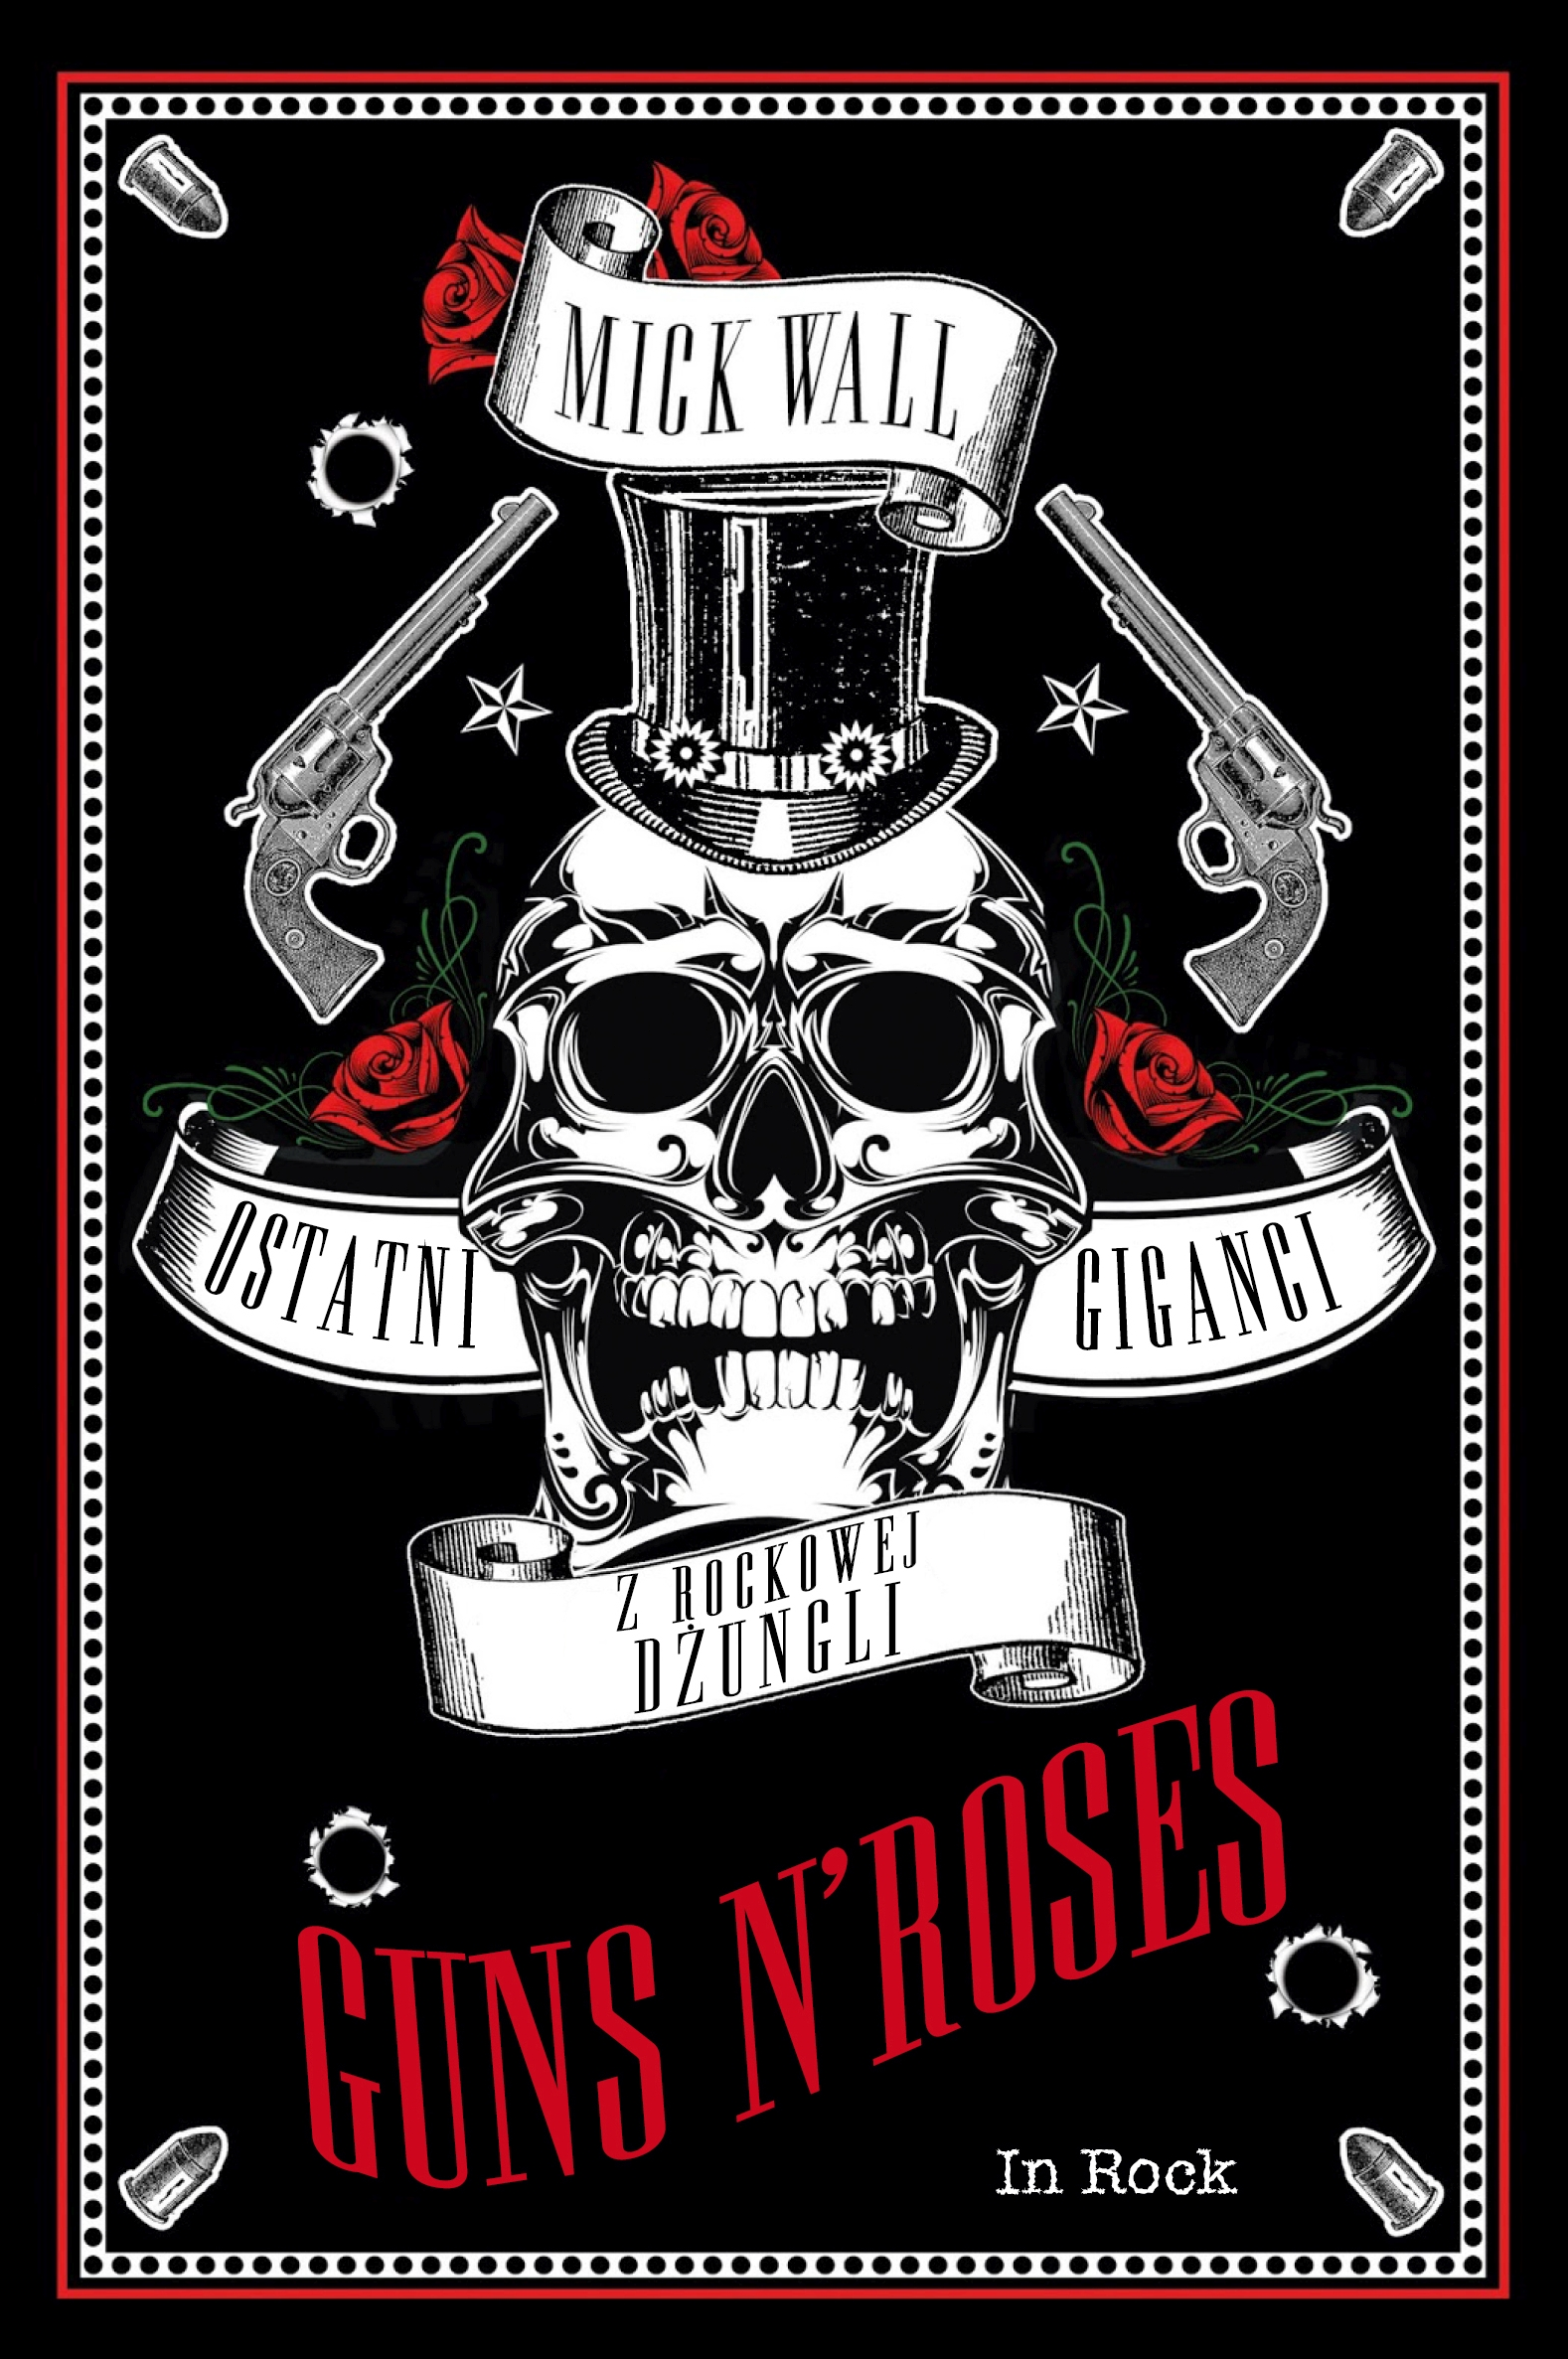 Mick Wall-Guns N' Roses. Ostatni giganci z rockowej dżungli